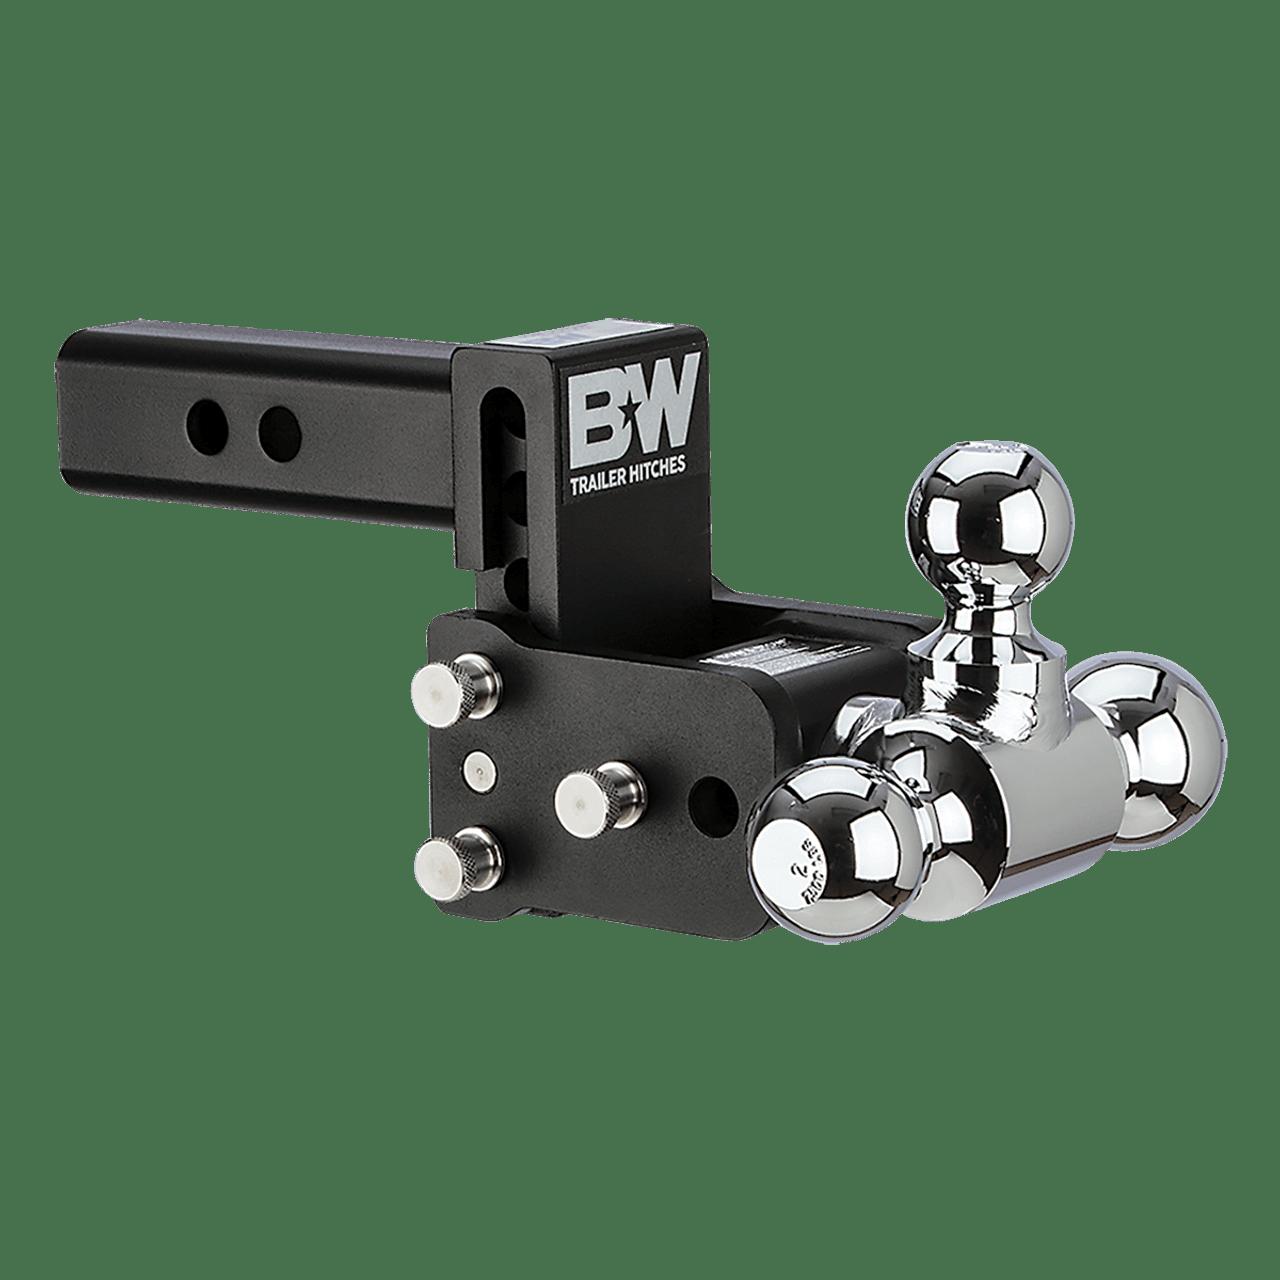 "QD10047B --- B&W 2"" Shank Tow and Stow Adjustable Tri-Ball Mount, 3"" Maximum Drop"